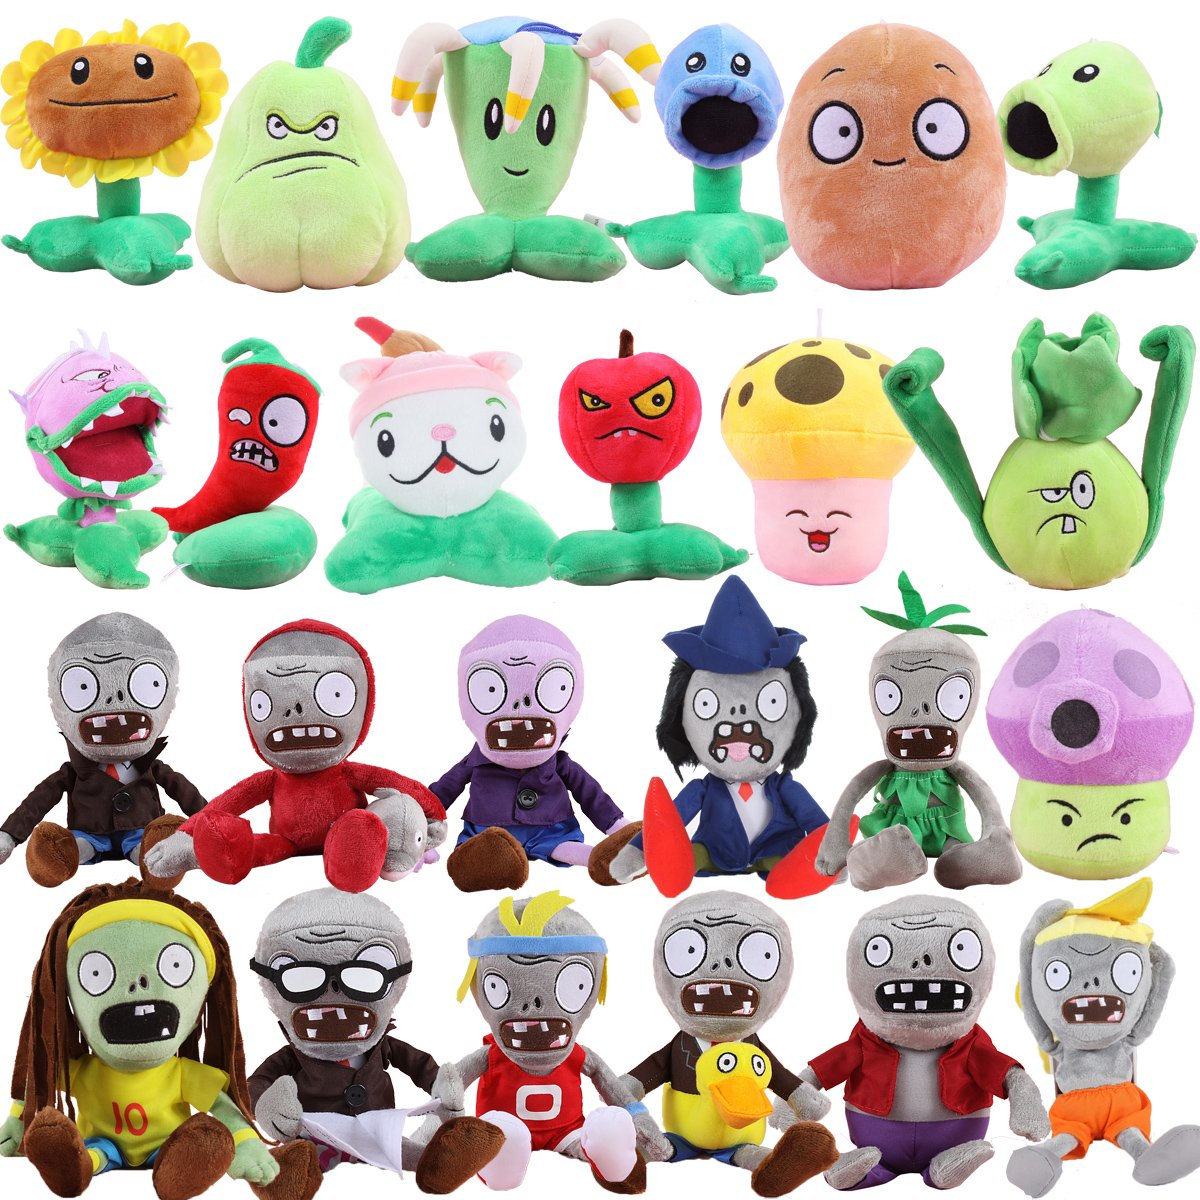 Plants vs Zombies 2 PVZ Figures Plush Toys Set (24pcs) Baby Staff Toy Stuffed Soft Doll Lot 15-20cm/6''-8'' Tall